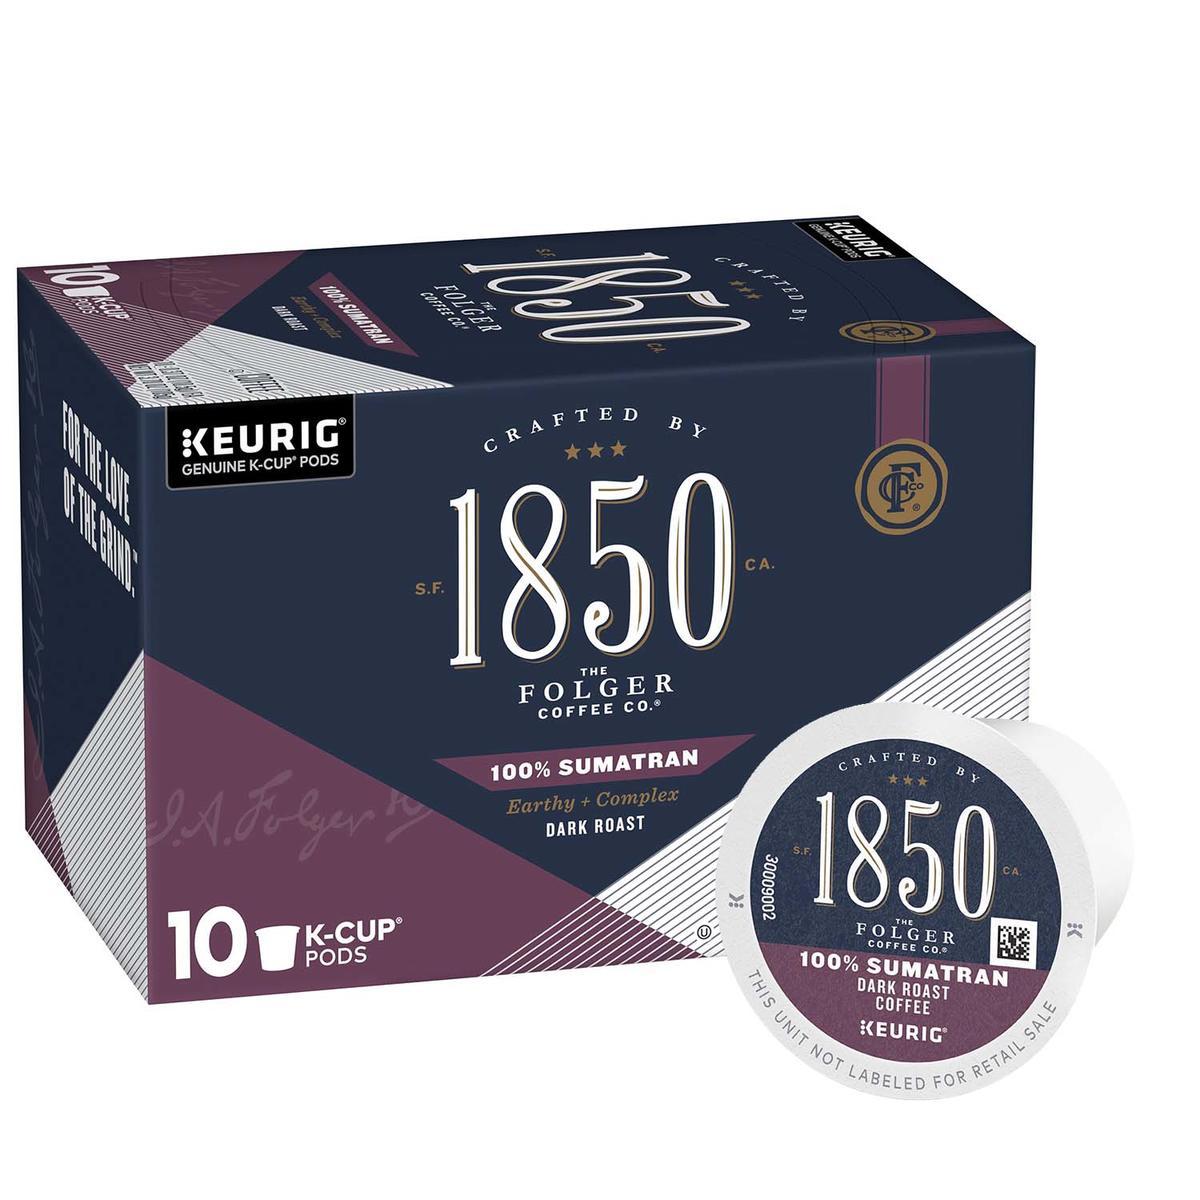 Folgers 1850 dark roast coffee, 100% Sumatran variety, 10 count box of k cups